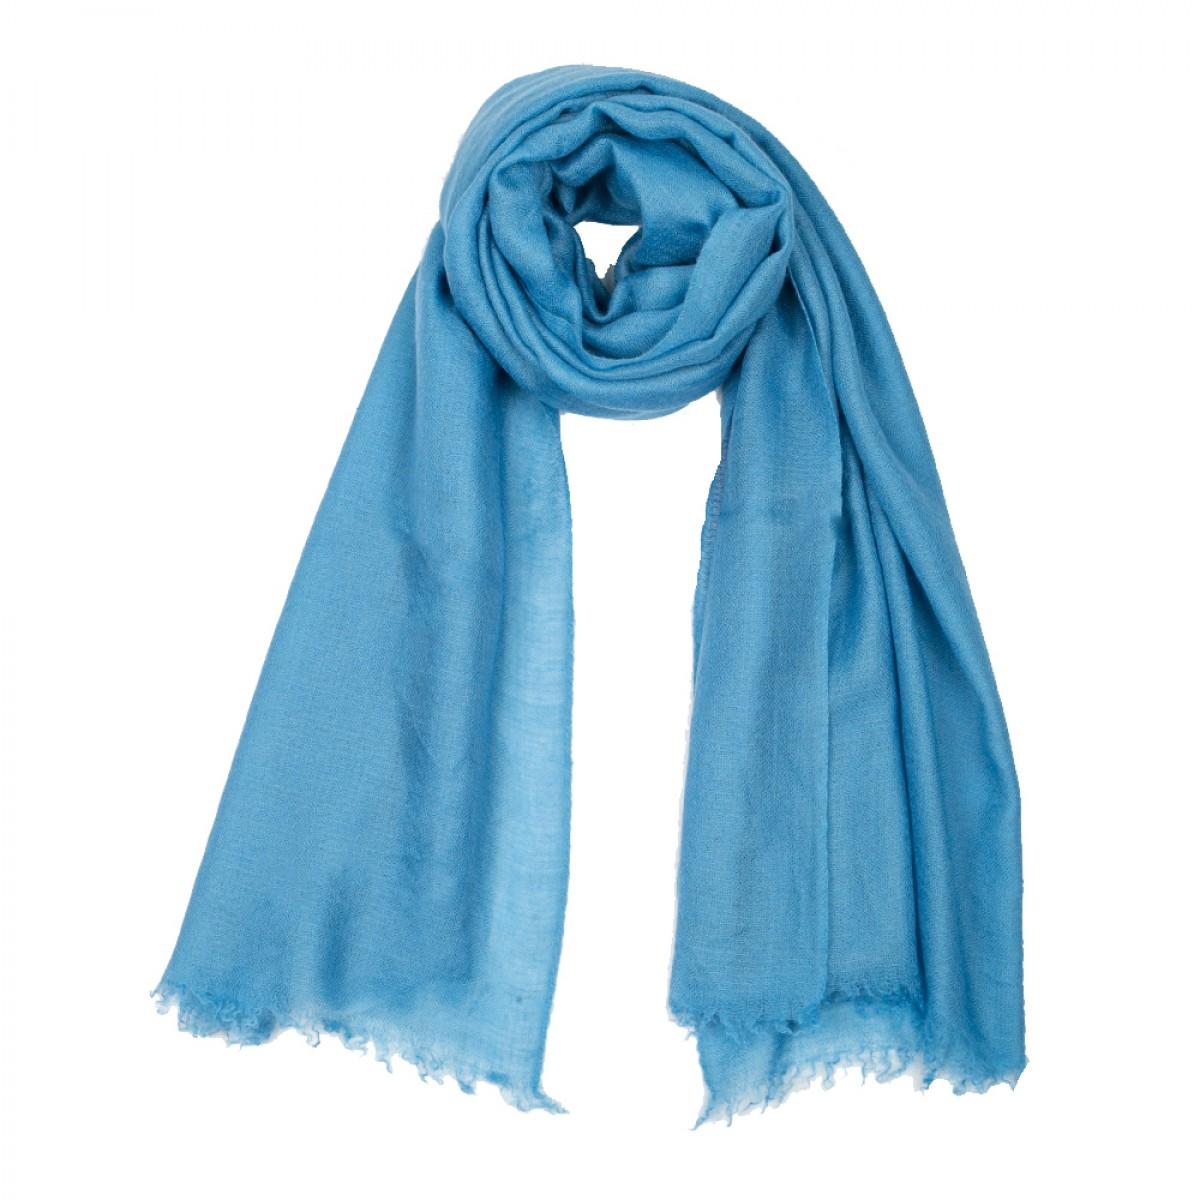 Plain Pashmina Stole - Cornflower Blue